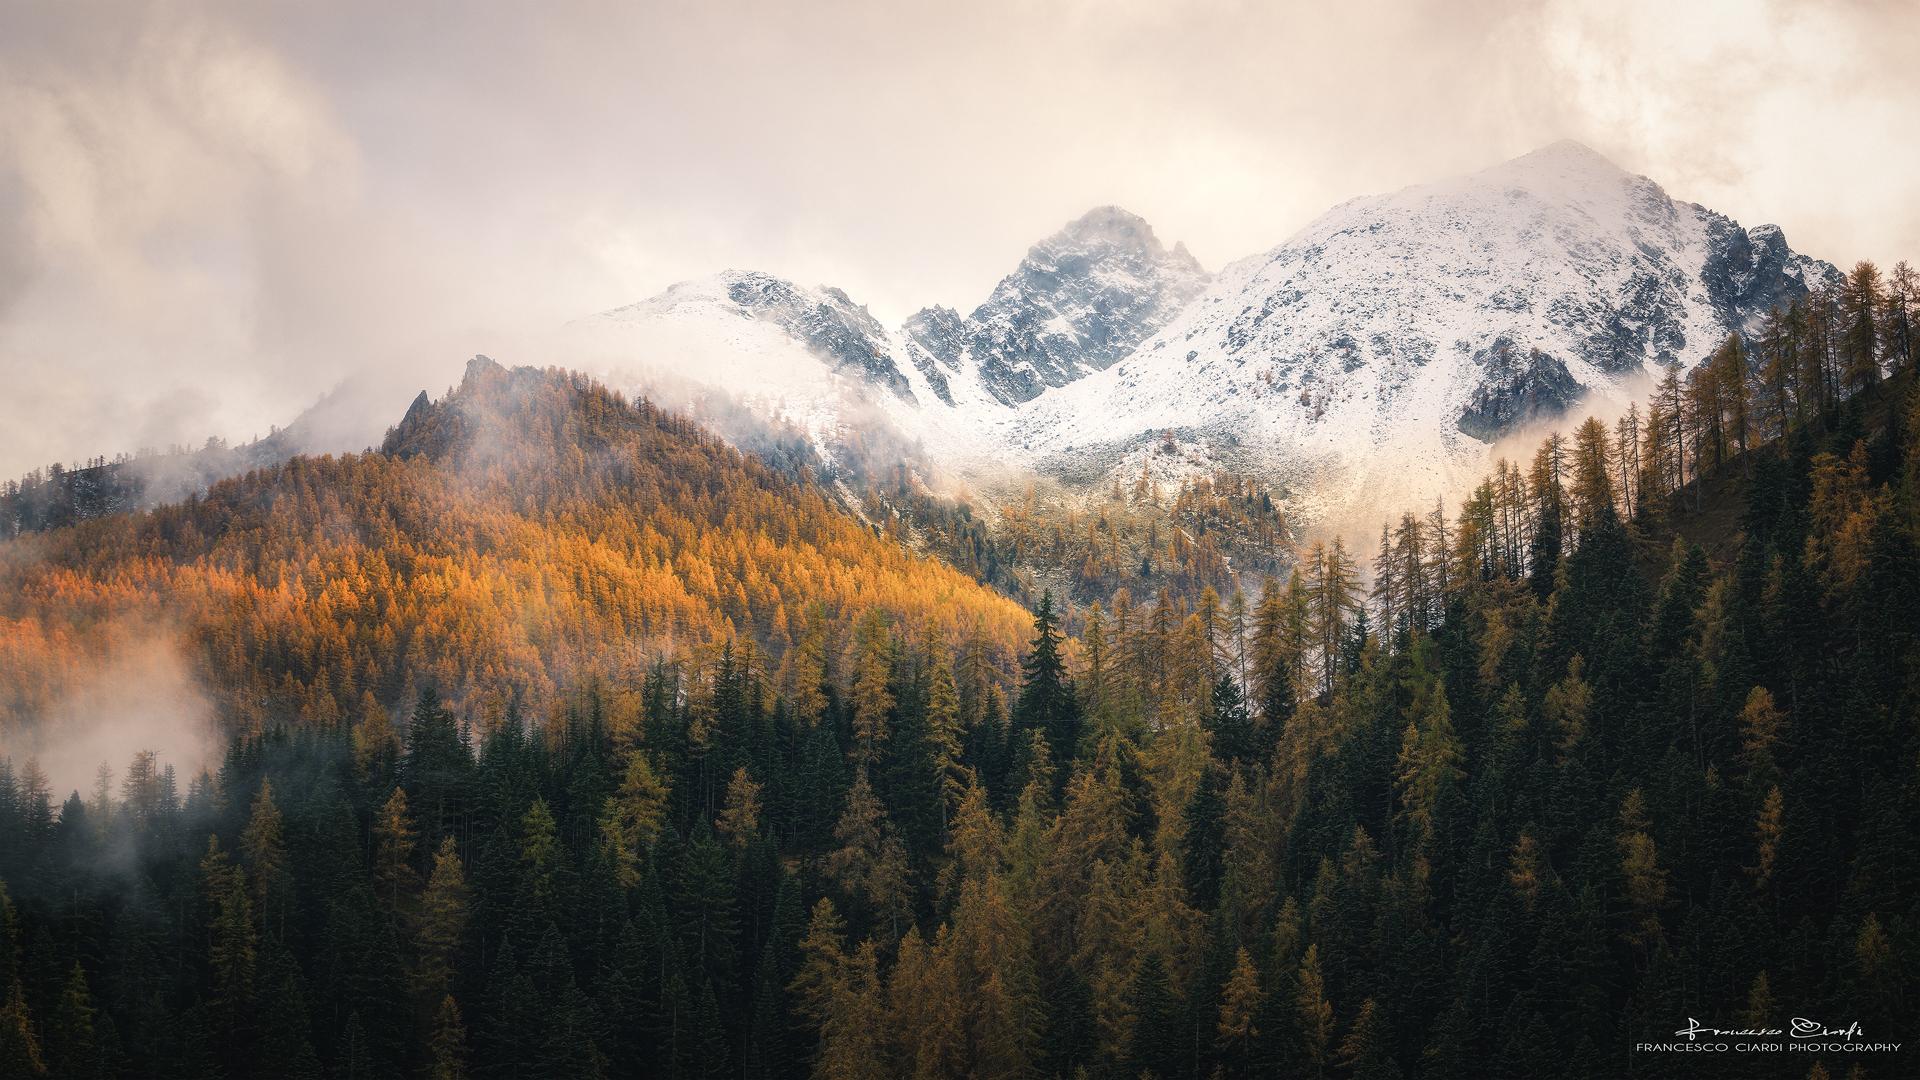 Winter knocks at the gates of autumn...